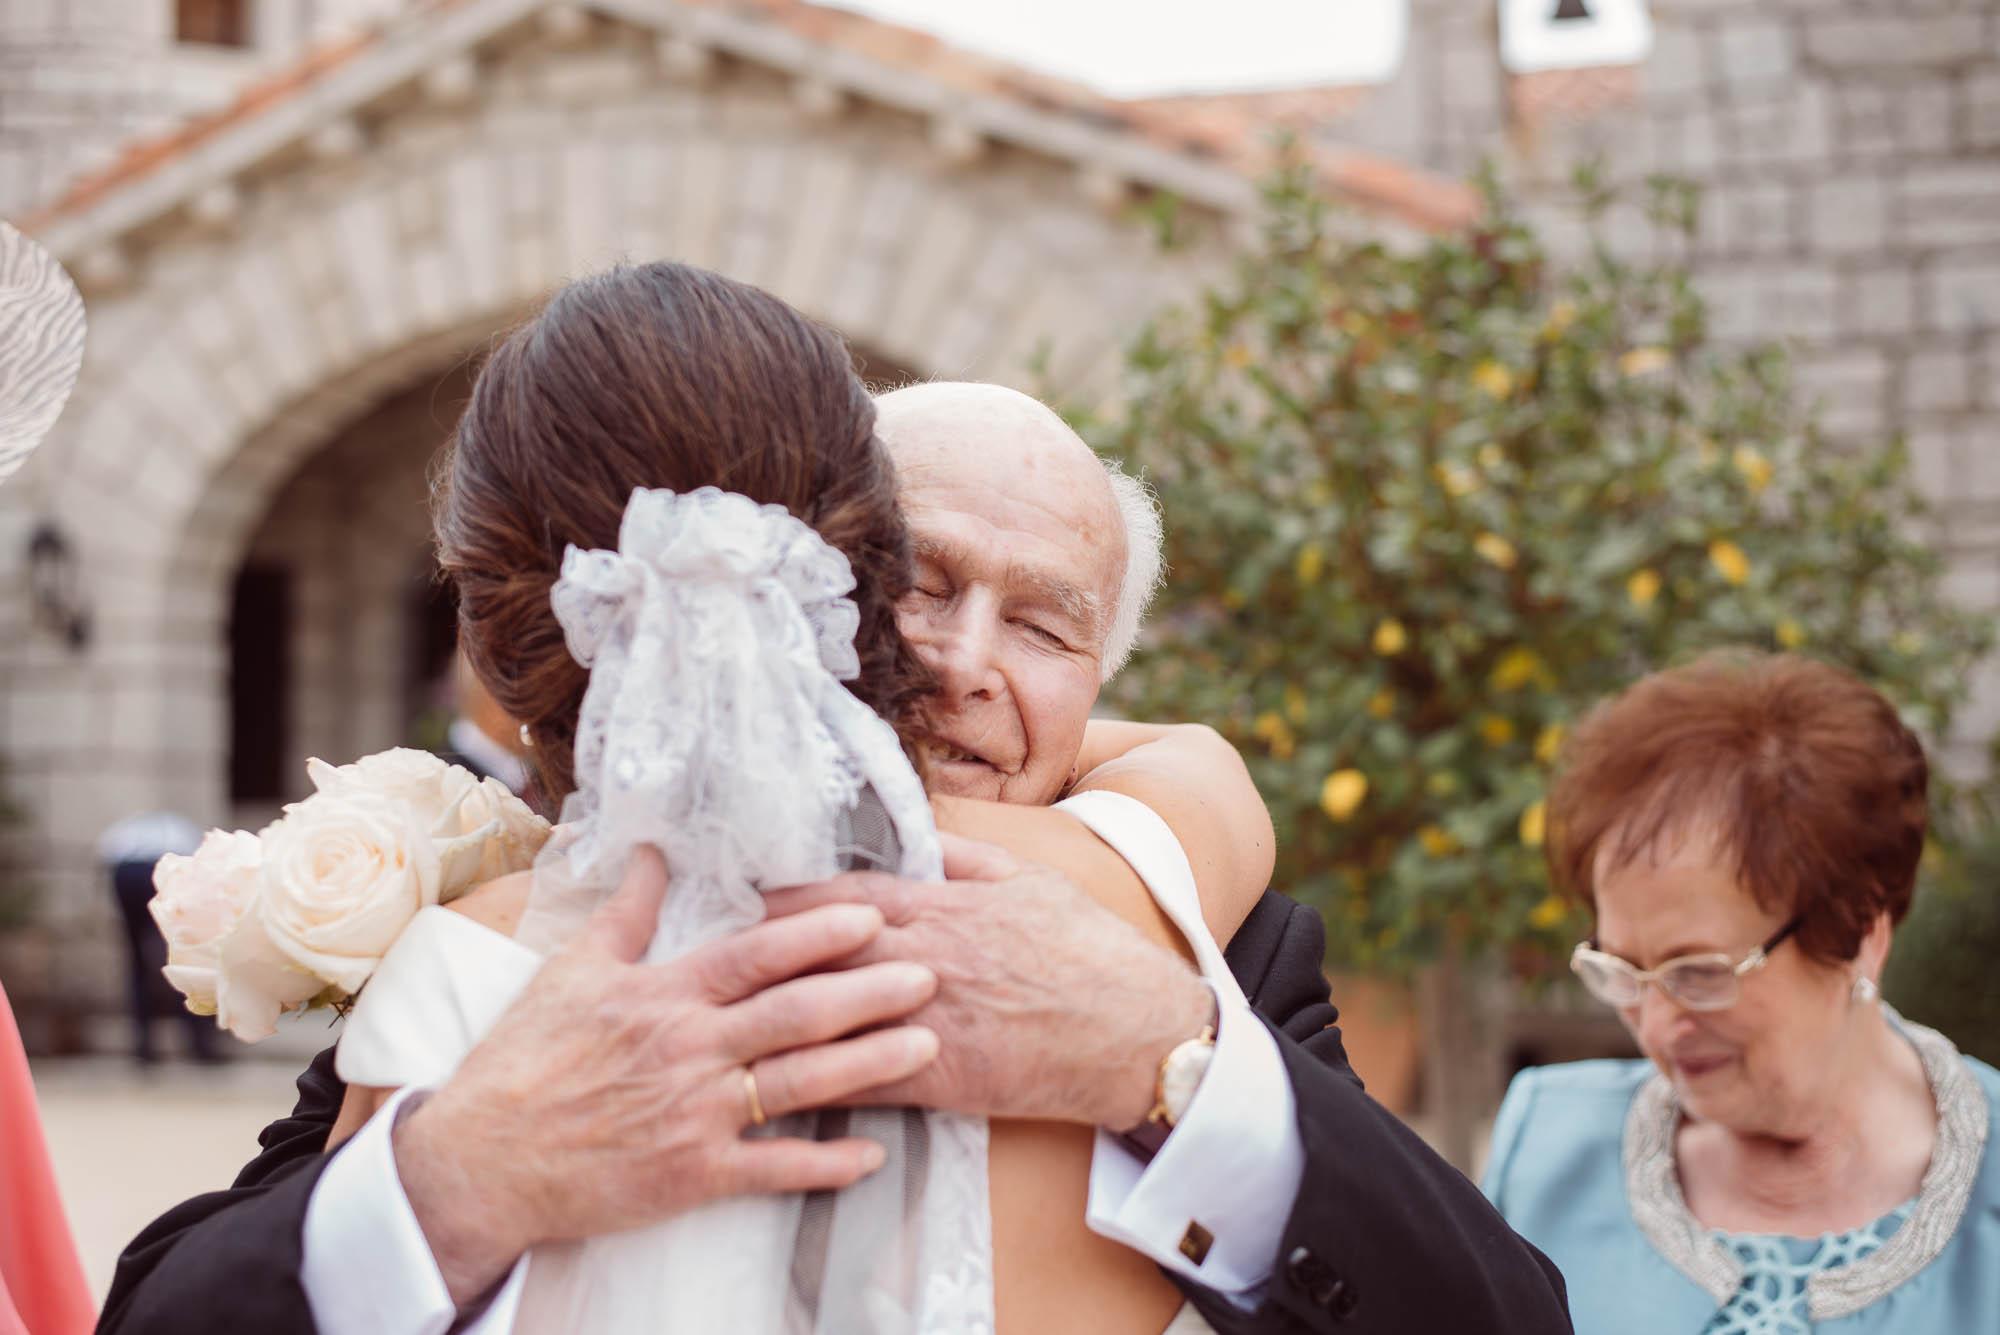 La novia abraza a su padre el dia de la boda